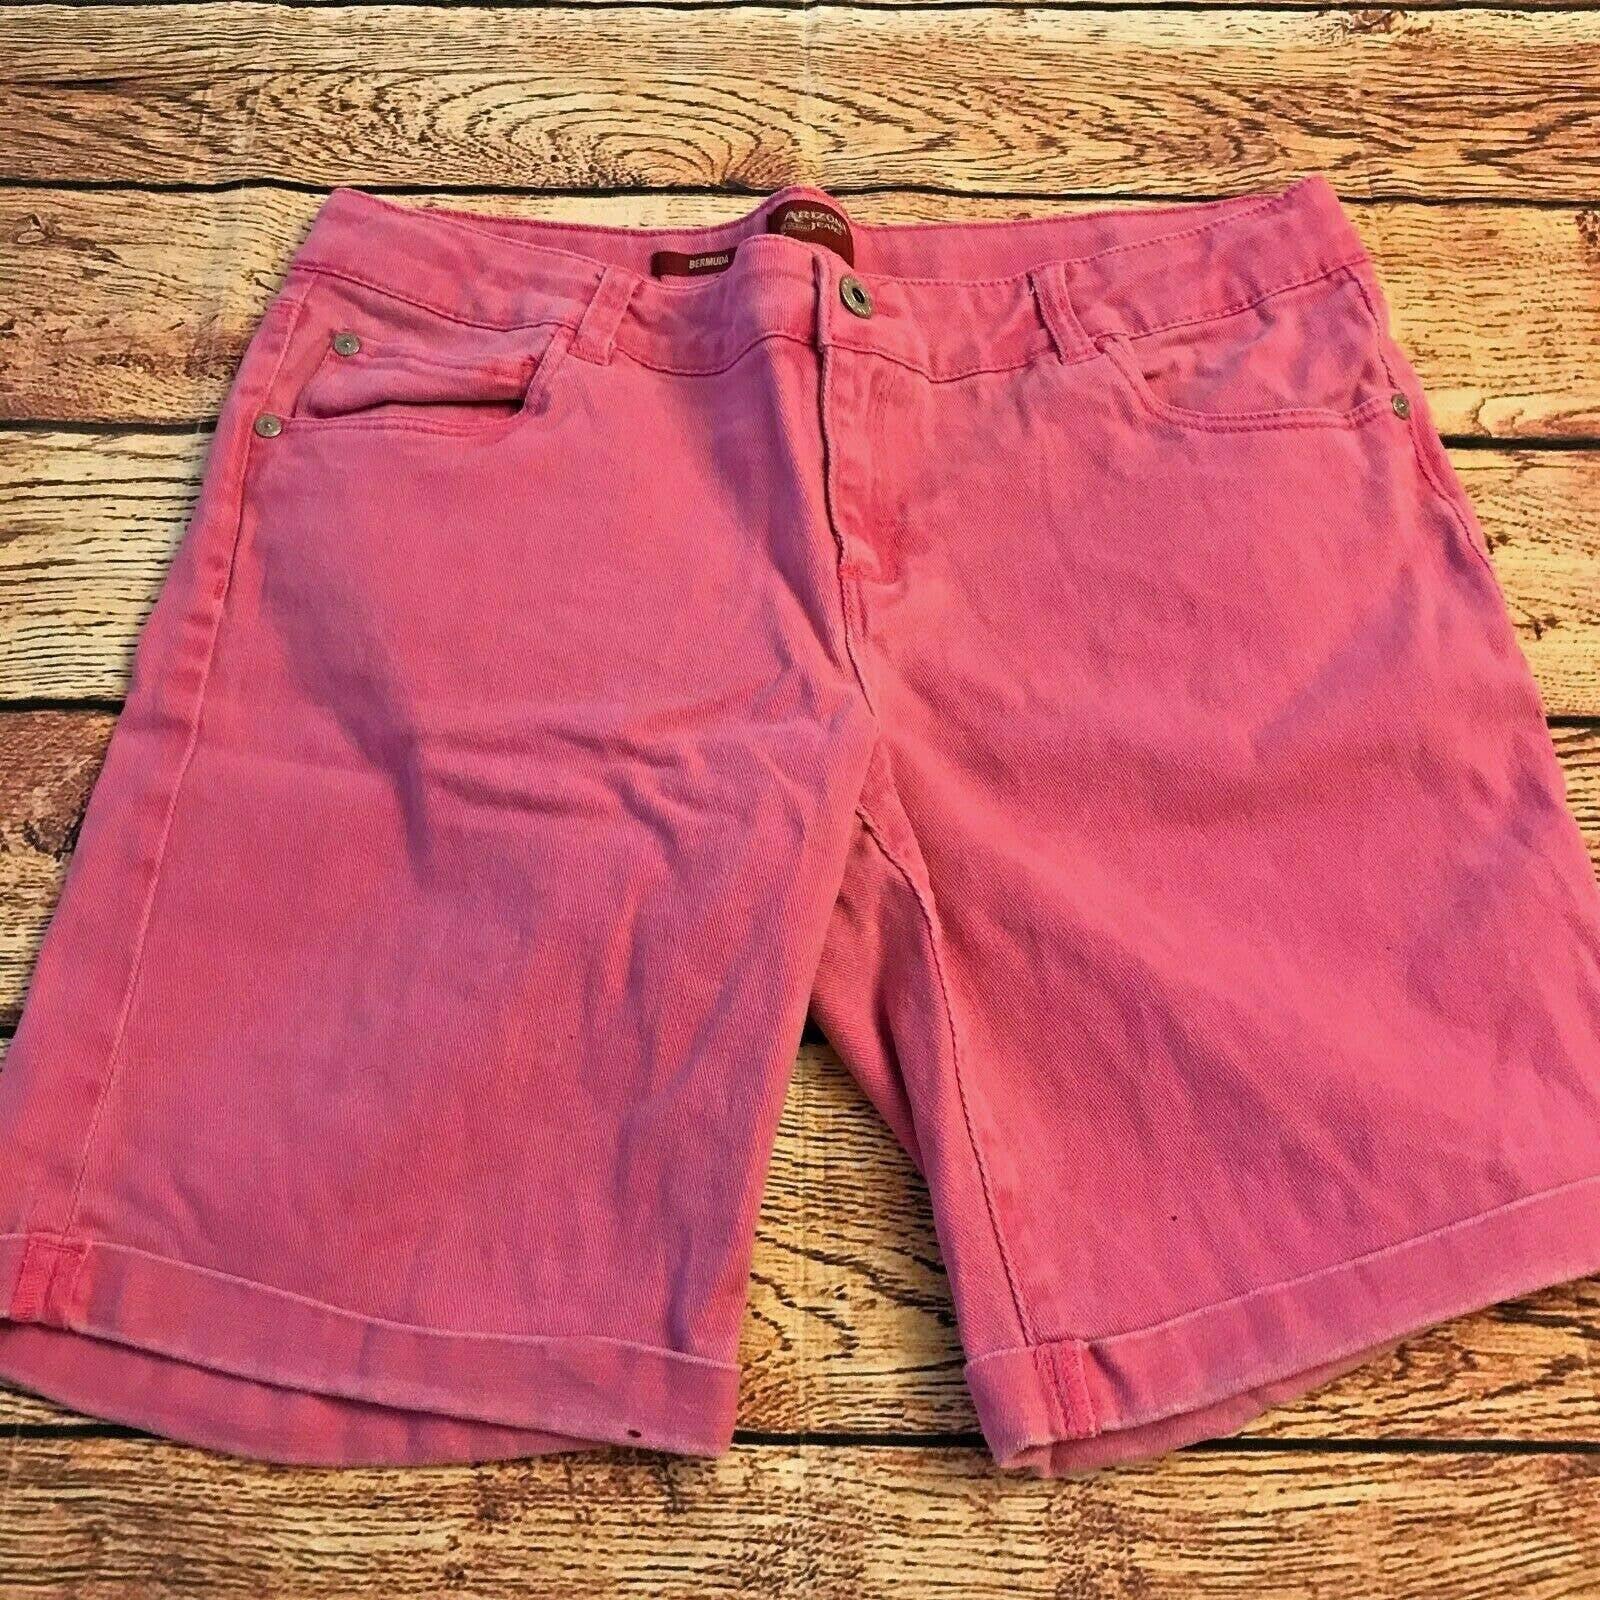 Arizona Jeans Girl's Bermuda Shorts 18.5